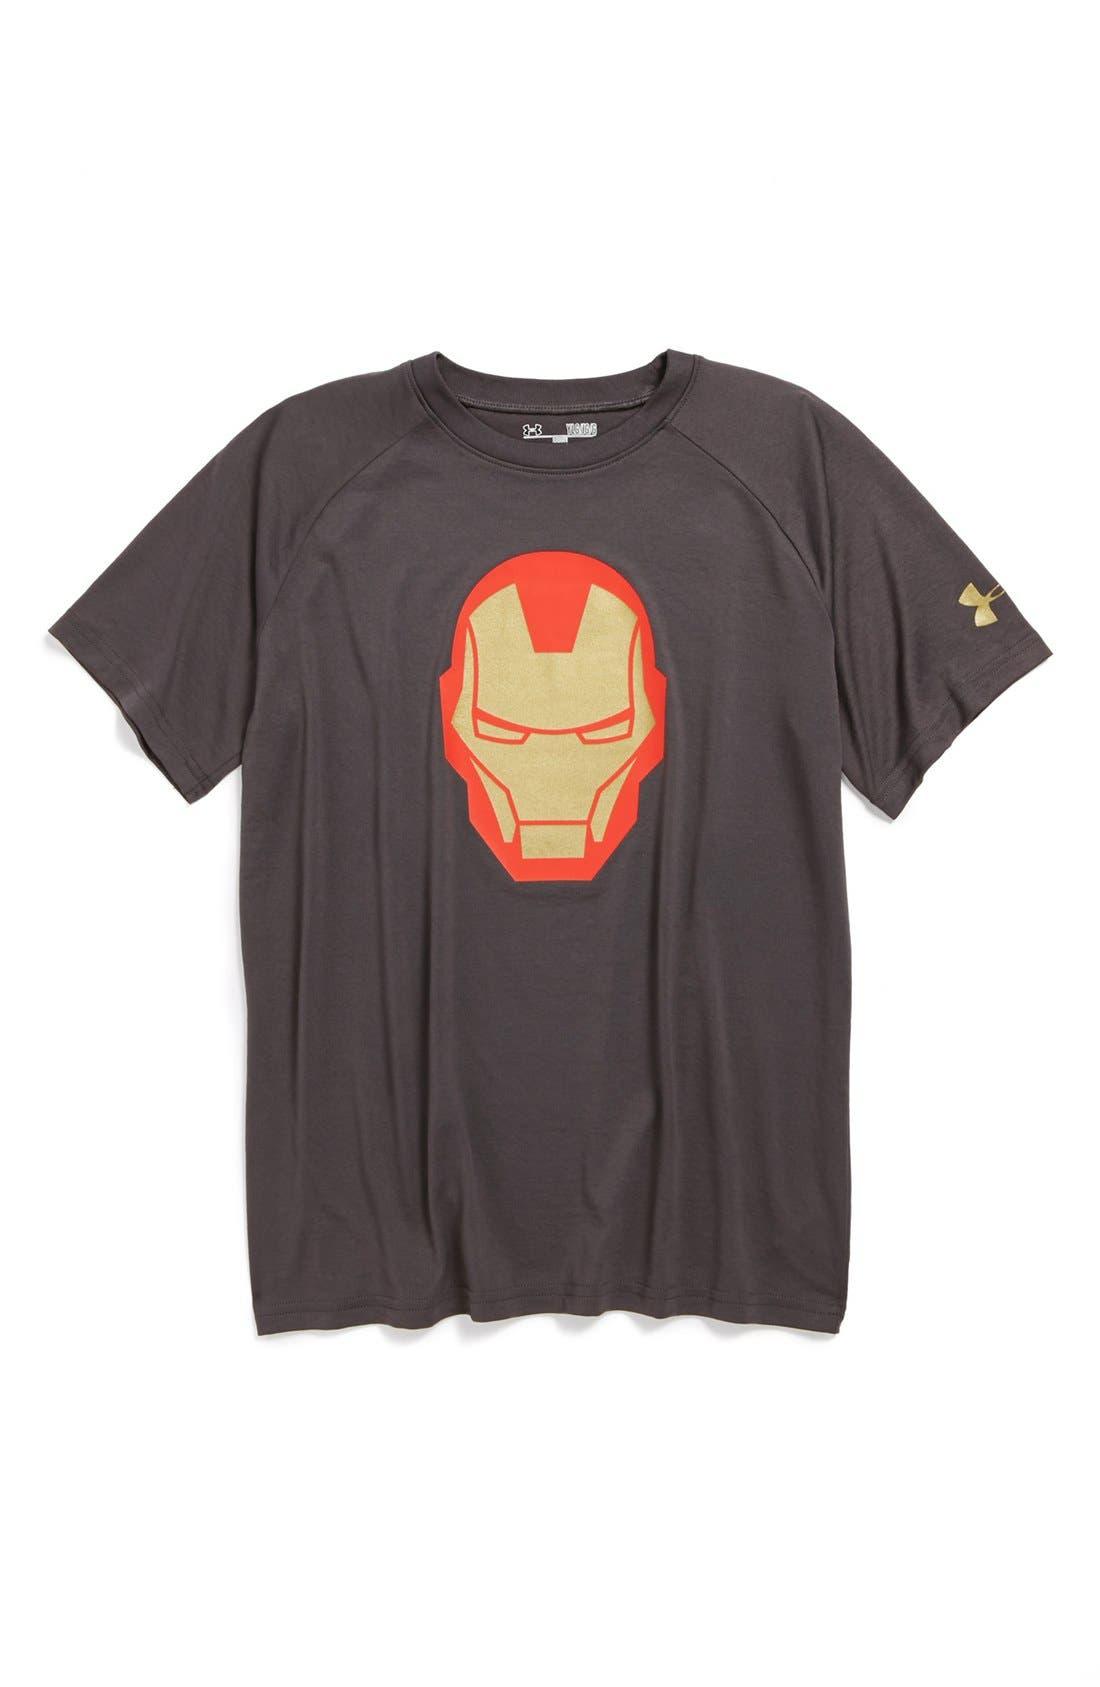 Main Image - Under Armour 'Iron Man' HeatGear® T-Shirt (Big Boys)